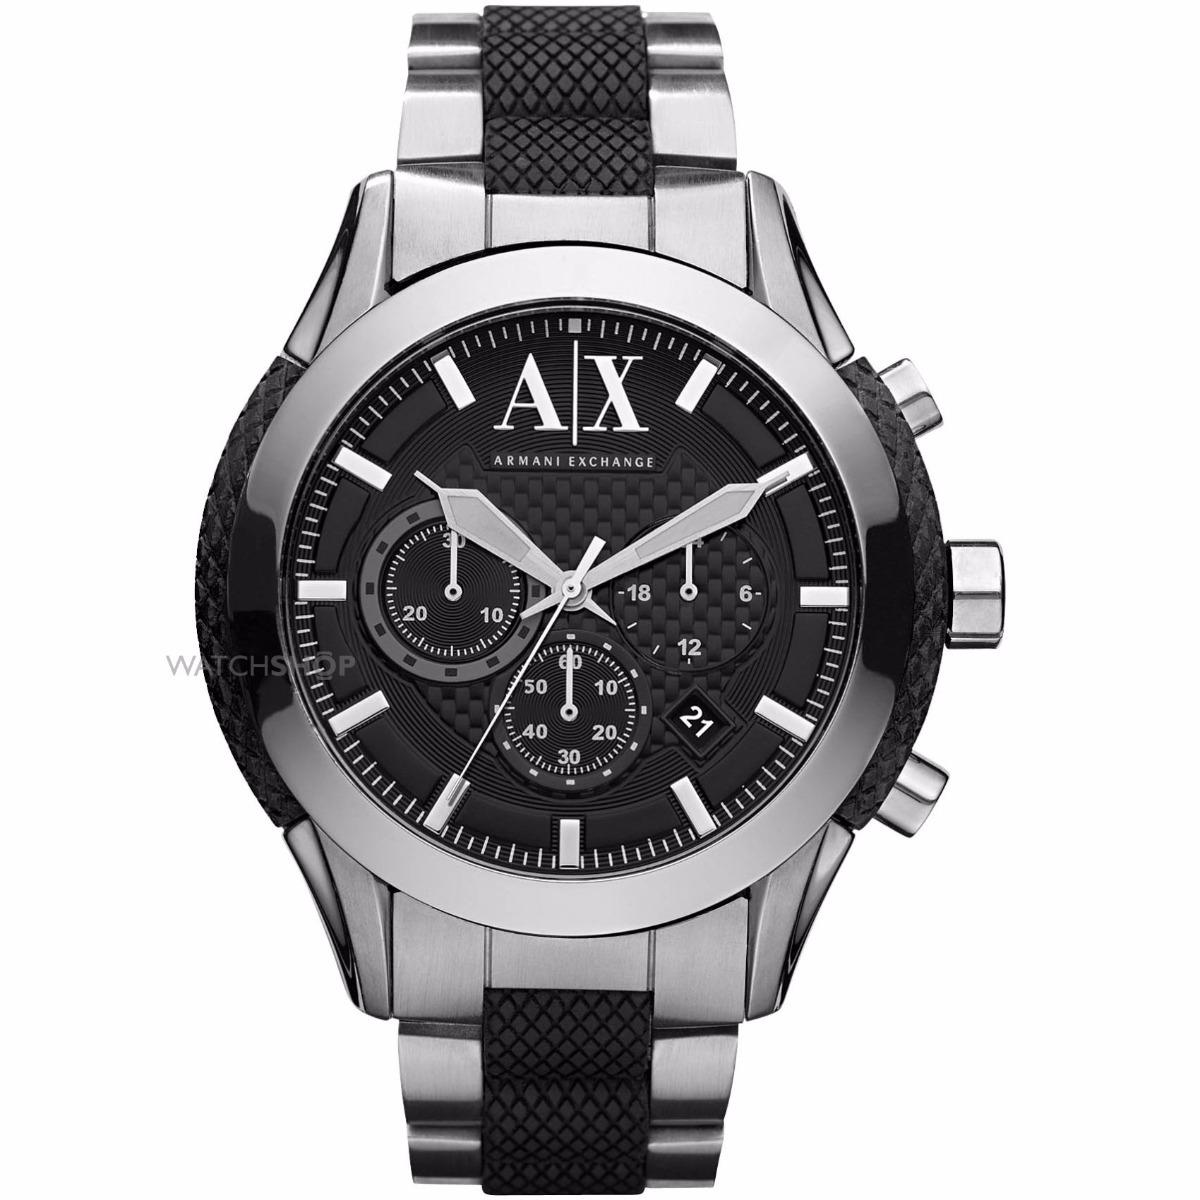 4831bc9a81d1 reloj armani exchange plateado negro ax1214 para caballero. Cargando zoom.